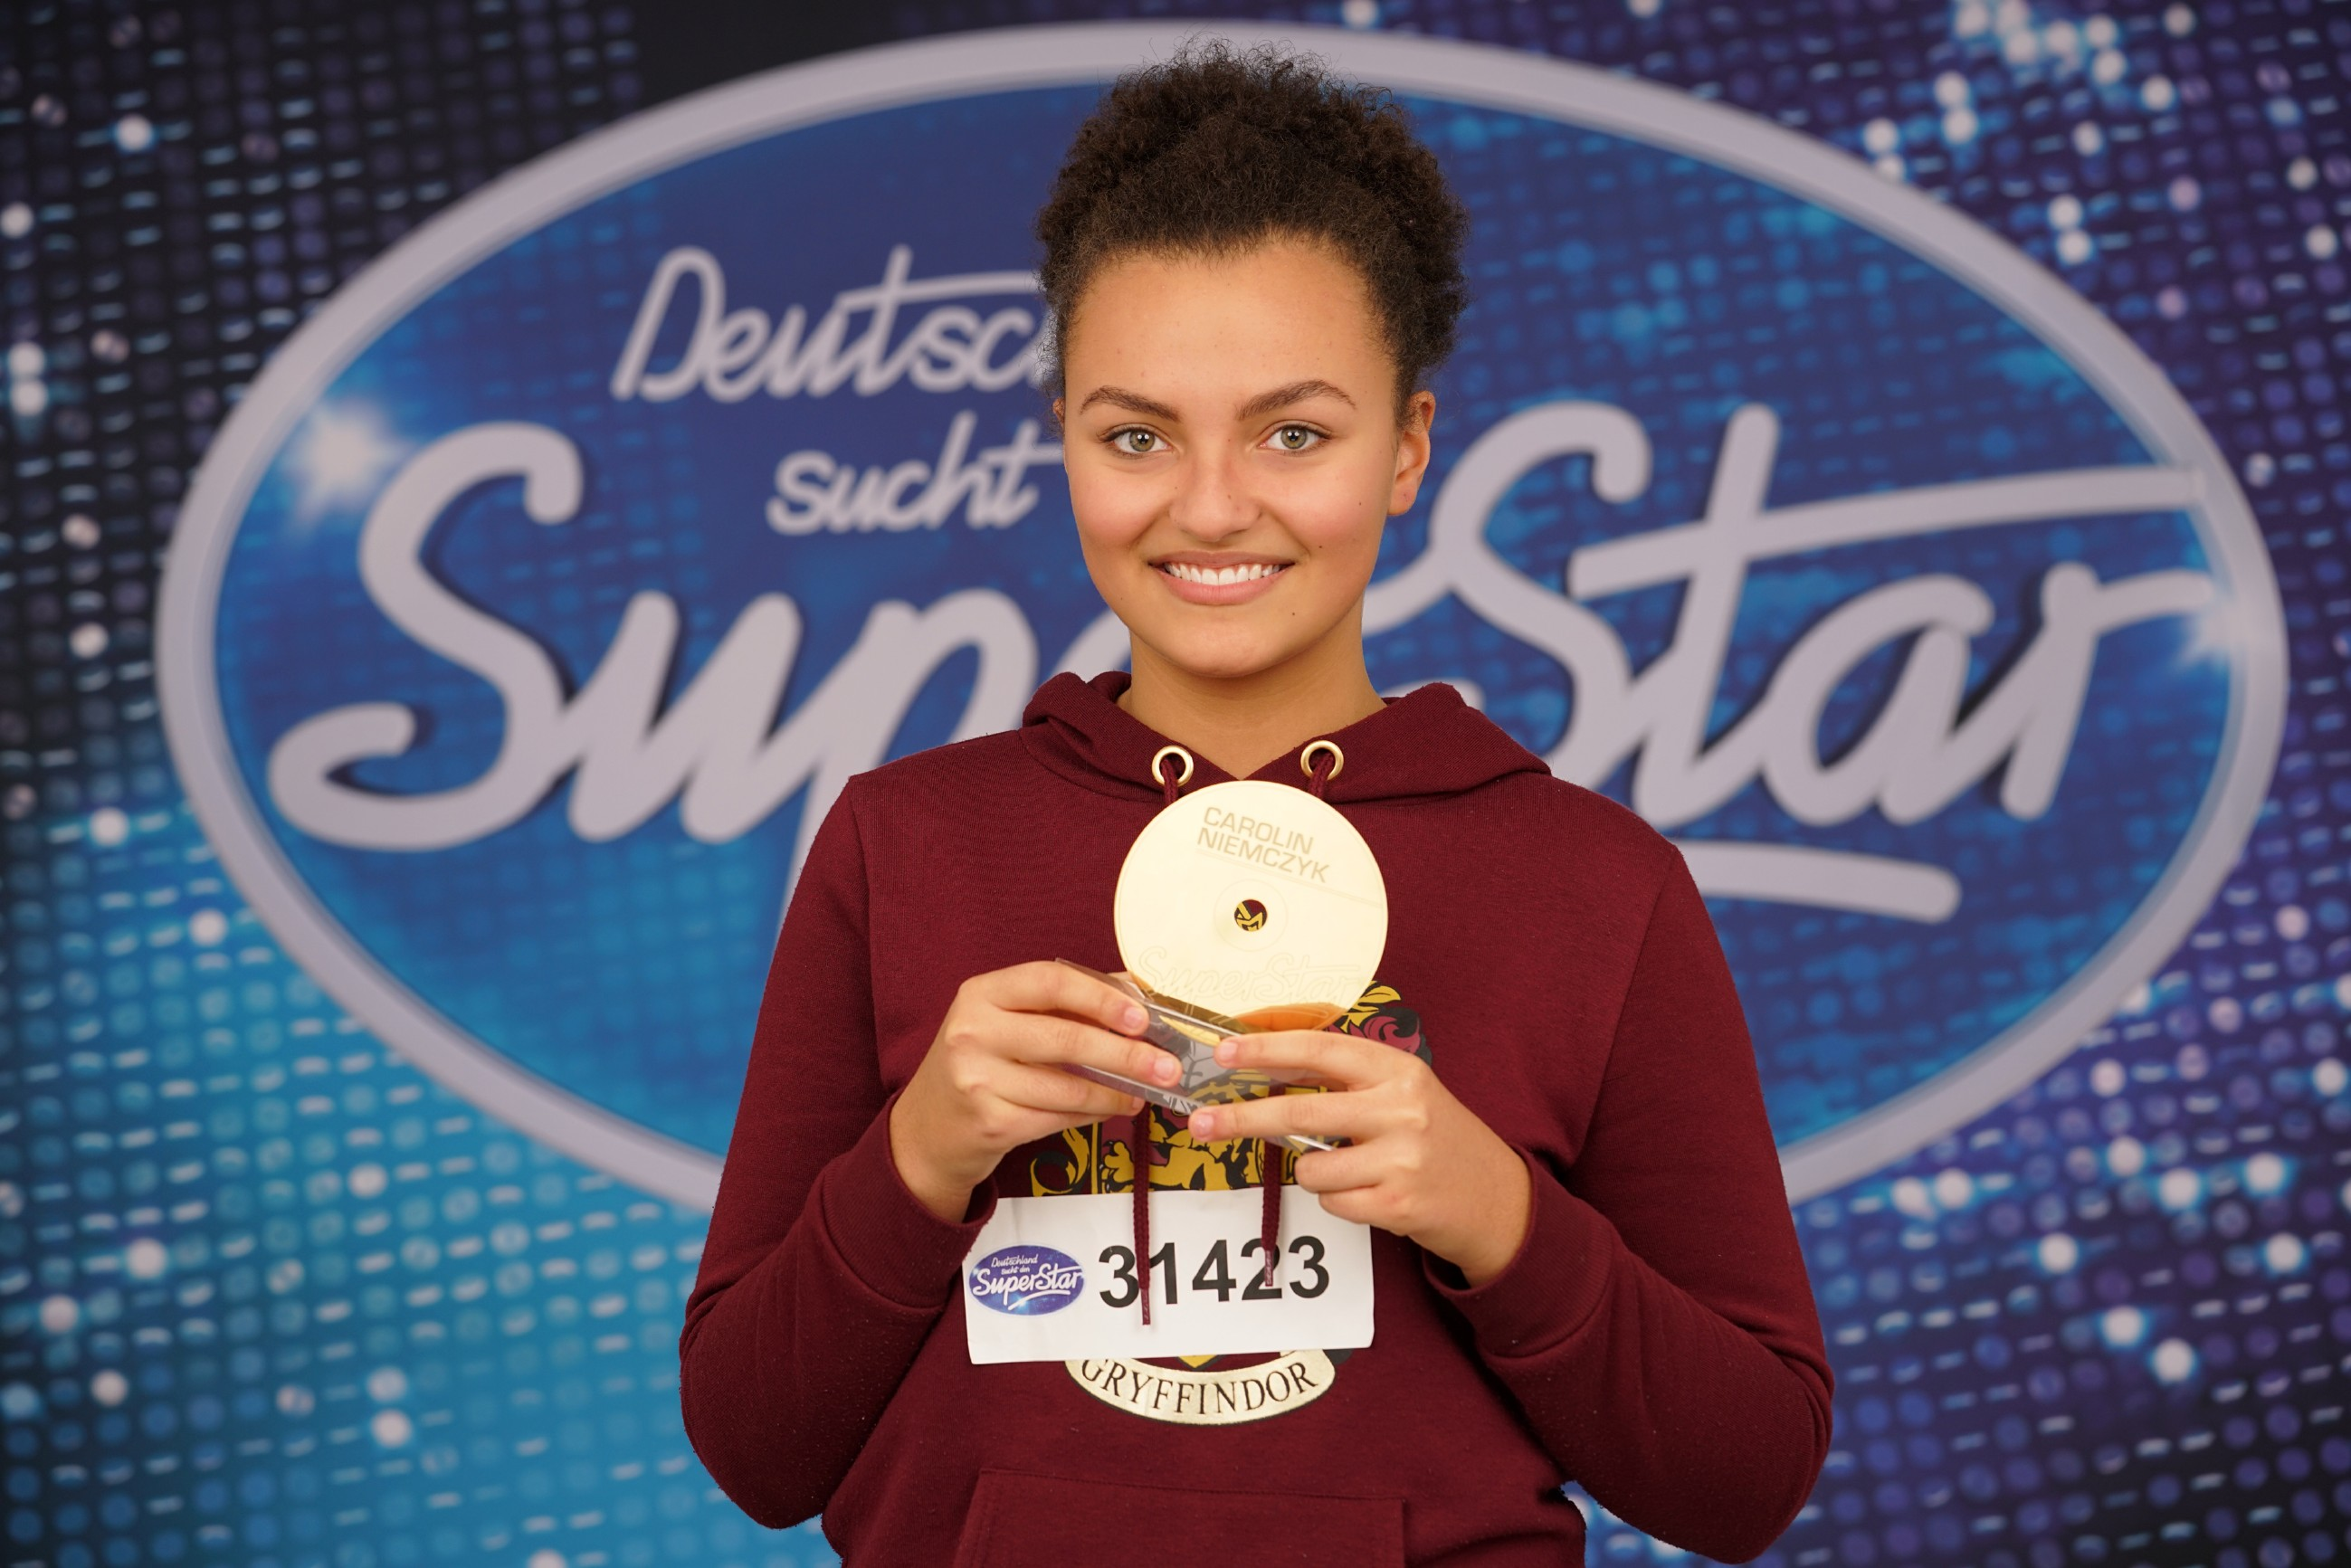 DSDS 2018 TOP 24 - Chantal Stachowiak